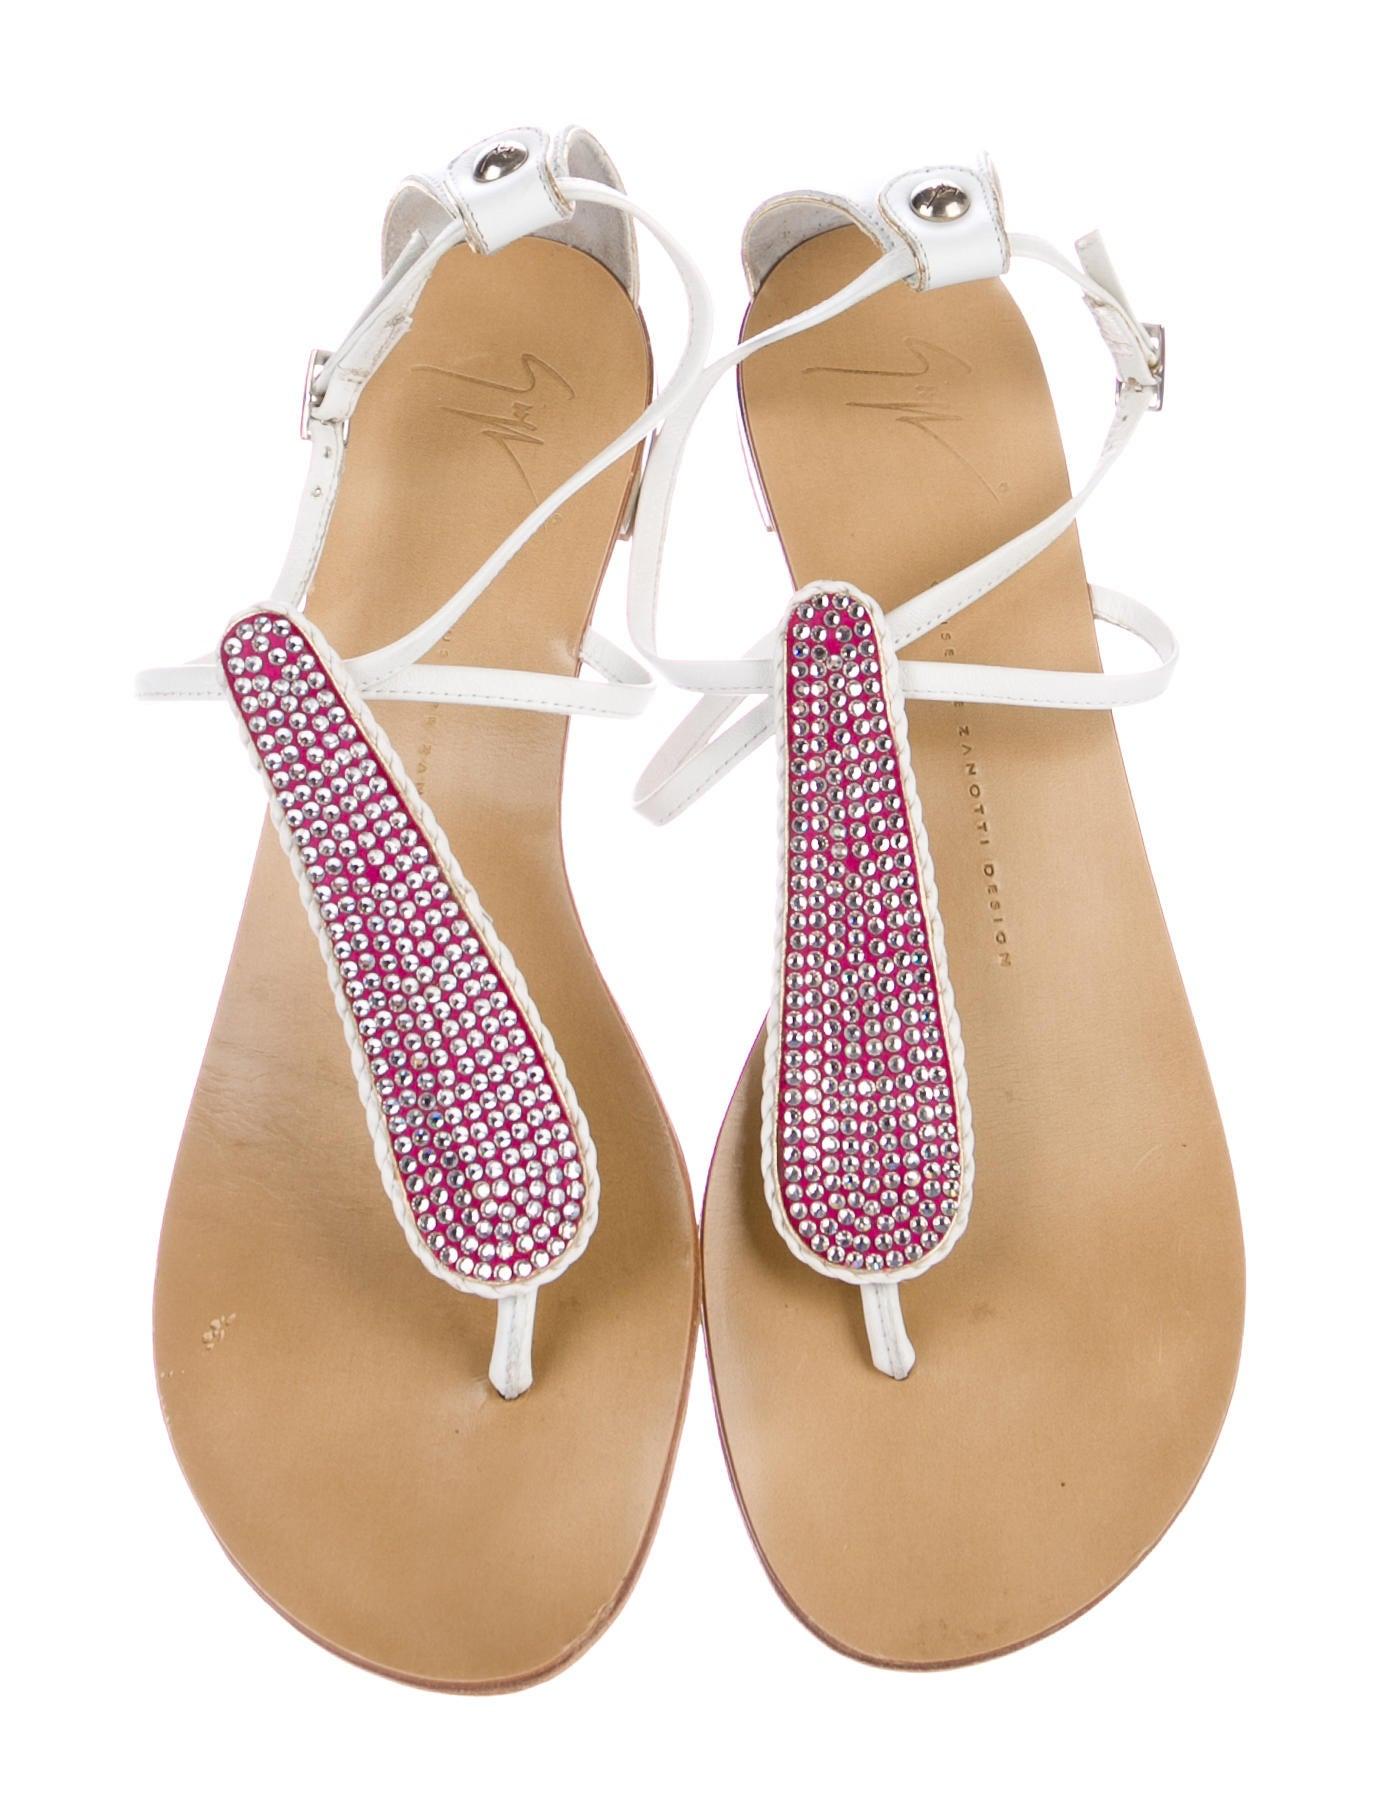 9de2741a19ad Giuseppe Zanotti Loafers Sale Price Jlo Shoes